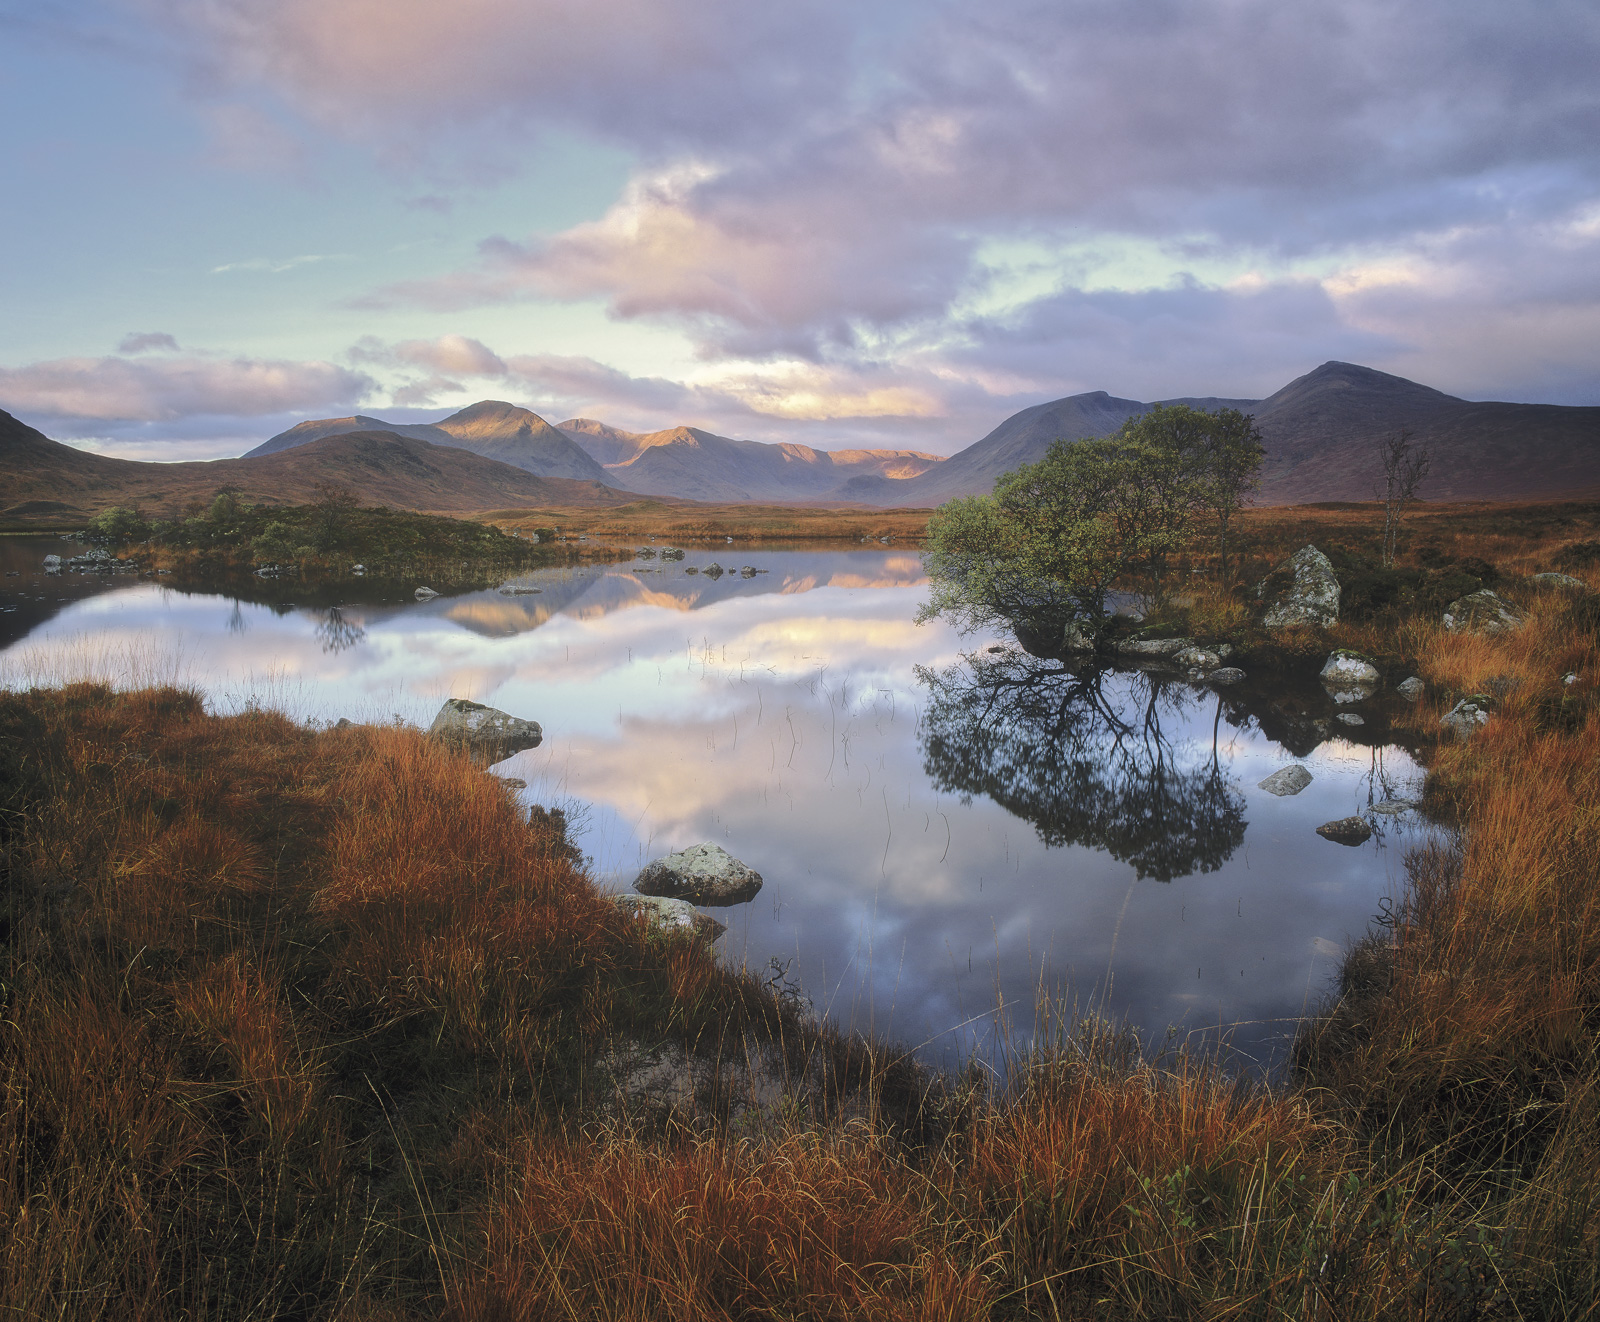 Rusty Rannoch, Rannoch Moor, Glencoe, Scotland, autumnal, foliage, tree, green, orange, fiery, grass, mountains, reflect, photo